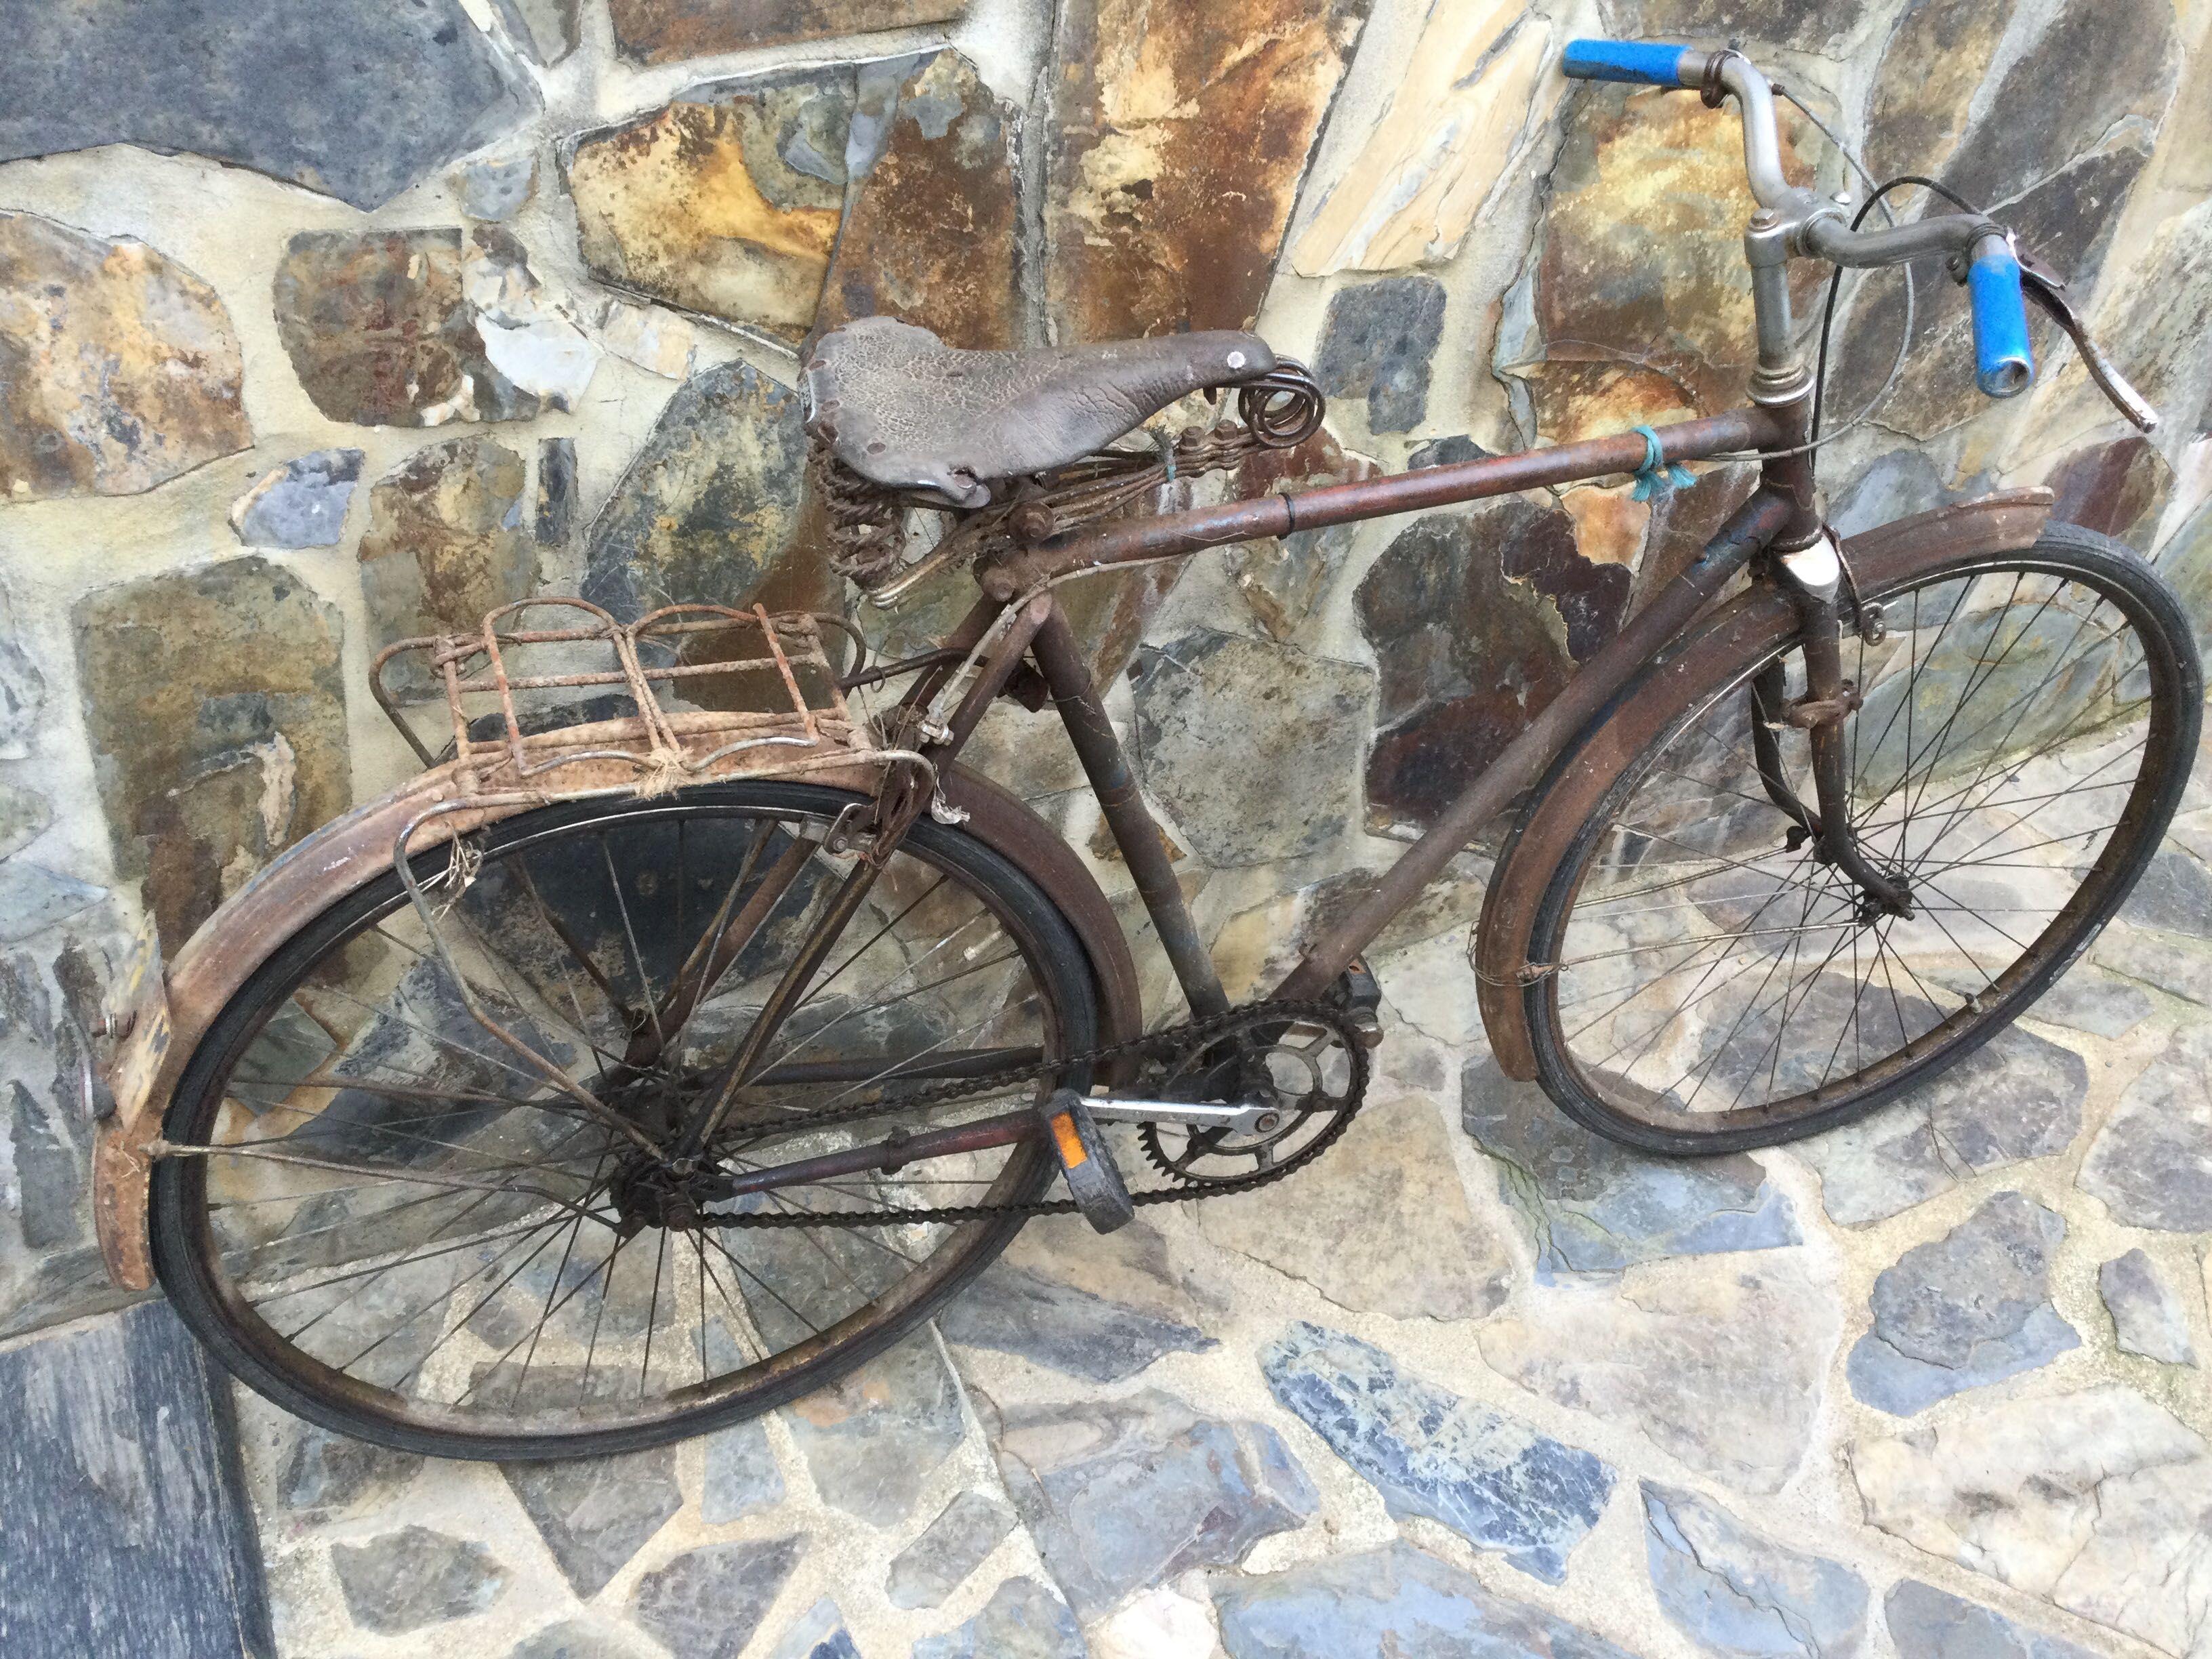 Bicicleta pasteleira Vintage Antiga Matrícula Alentejo Odemira